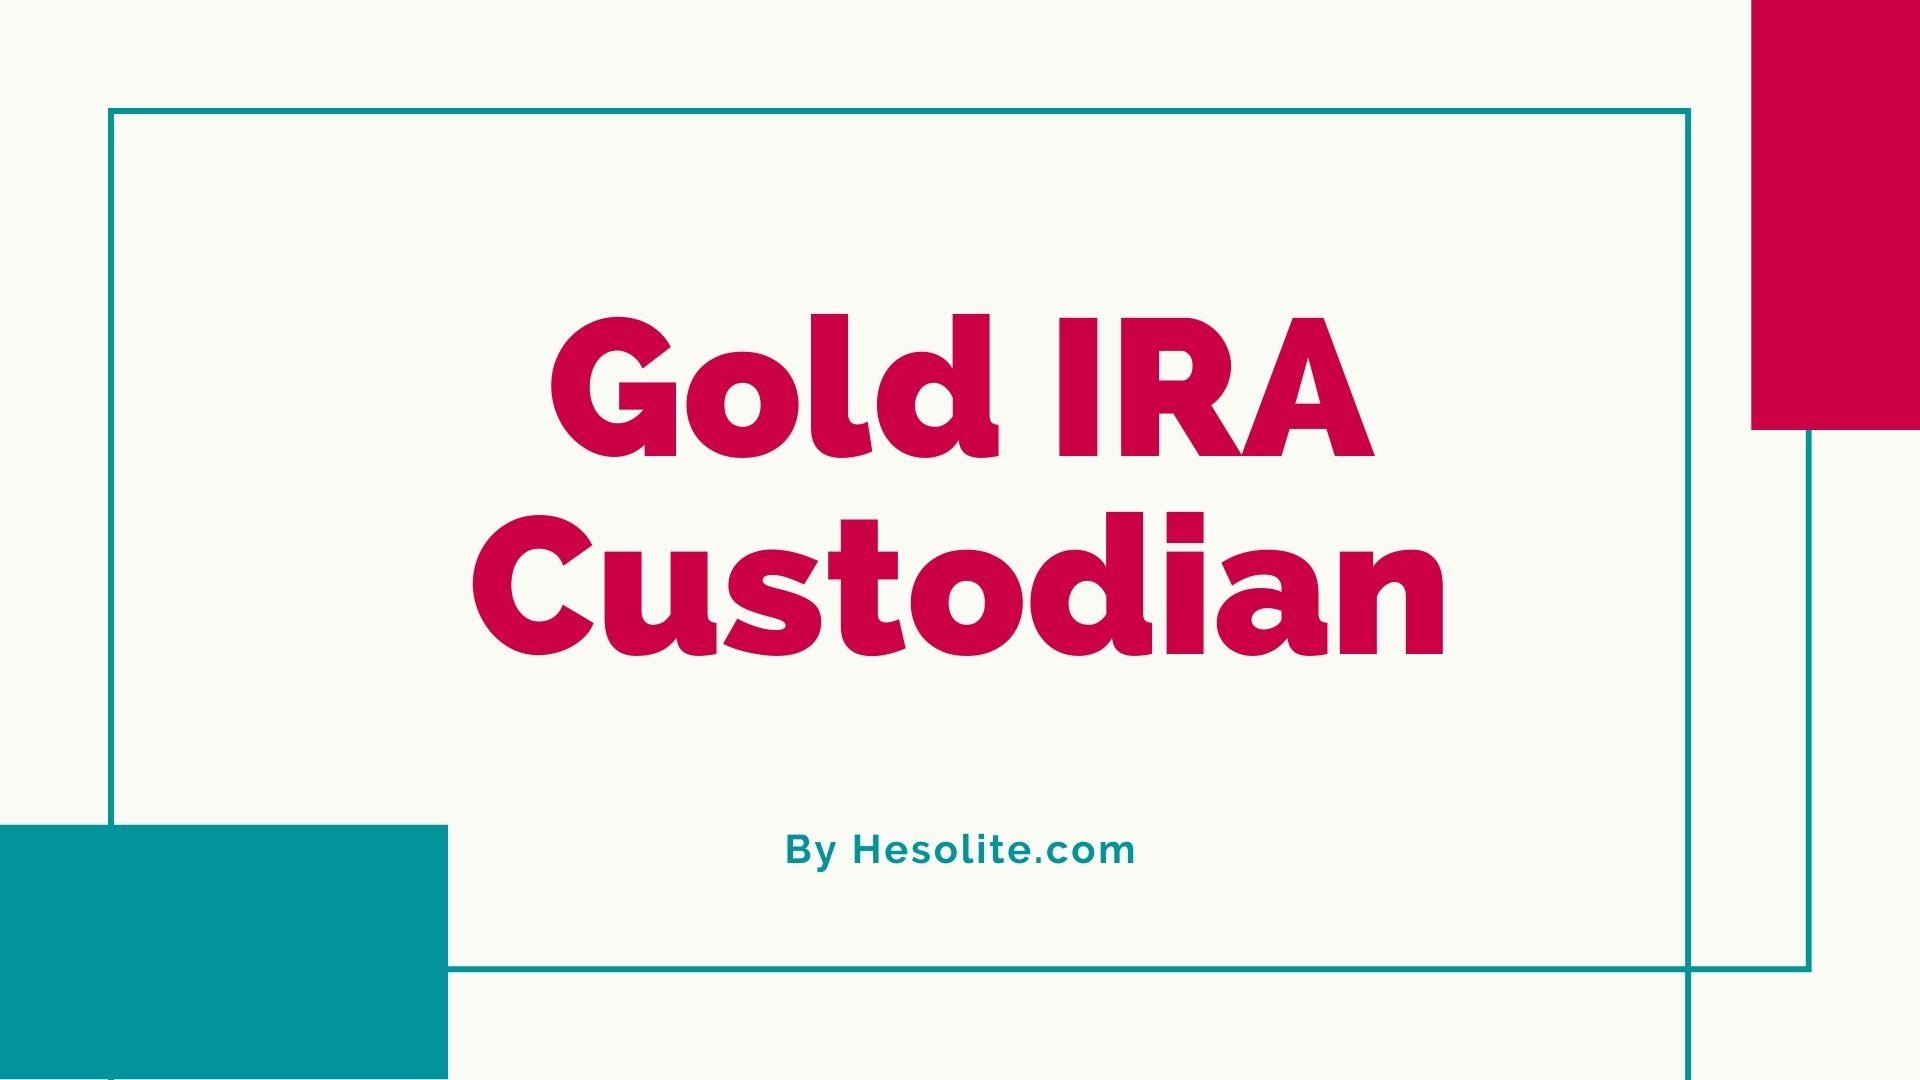 Gold IRA Custodian